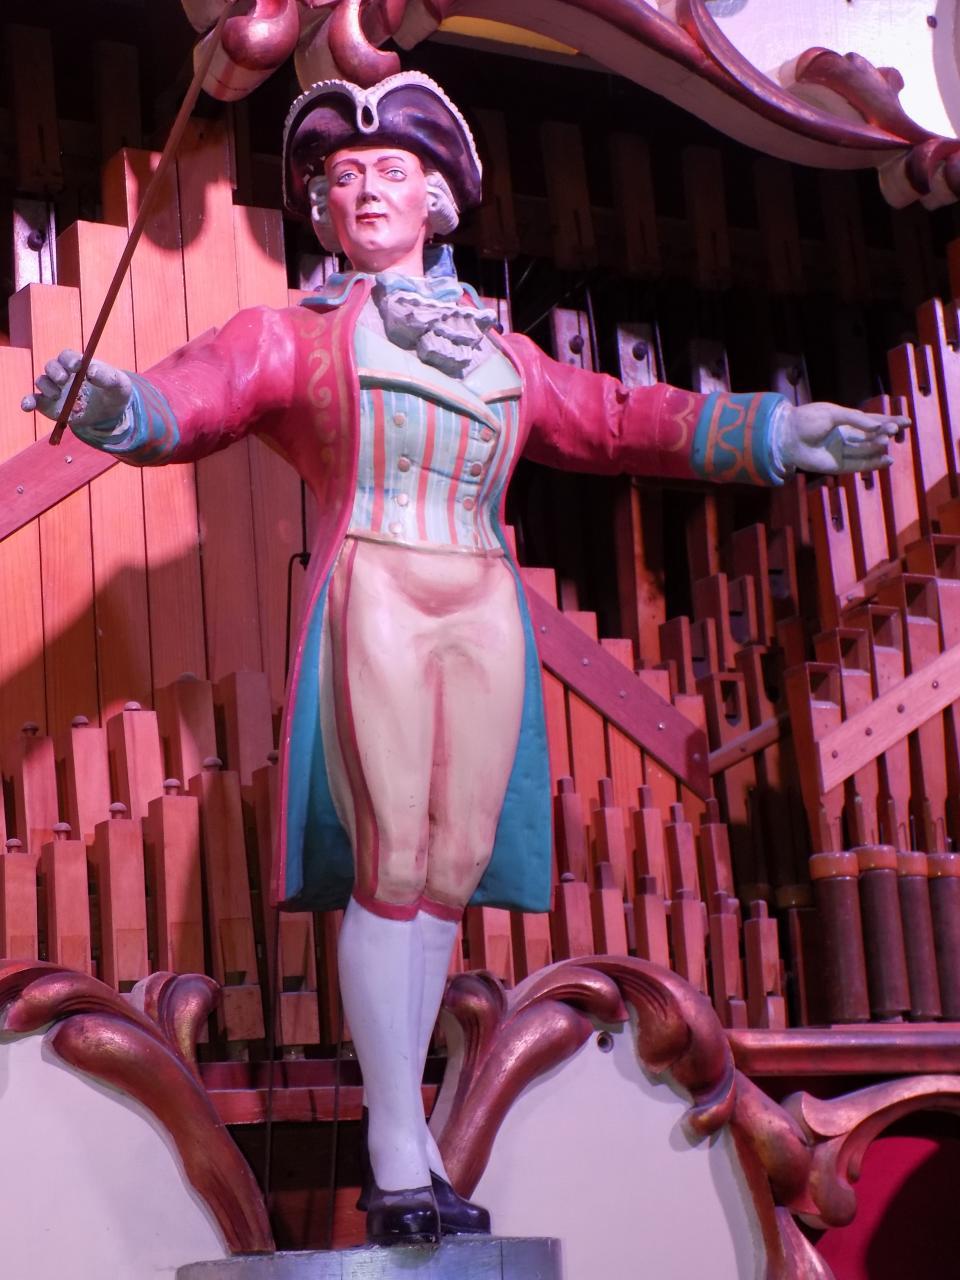 IMPORTANT NEWS regarding Bumpstead Antiques & Interiors